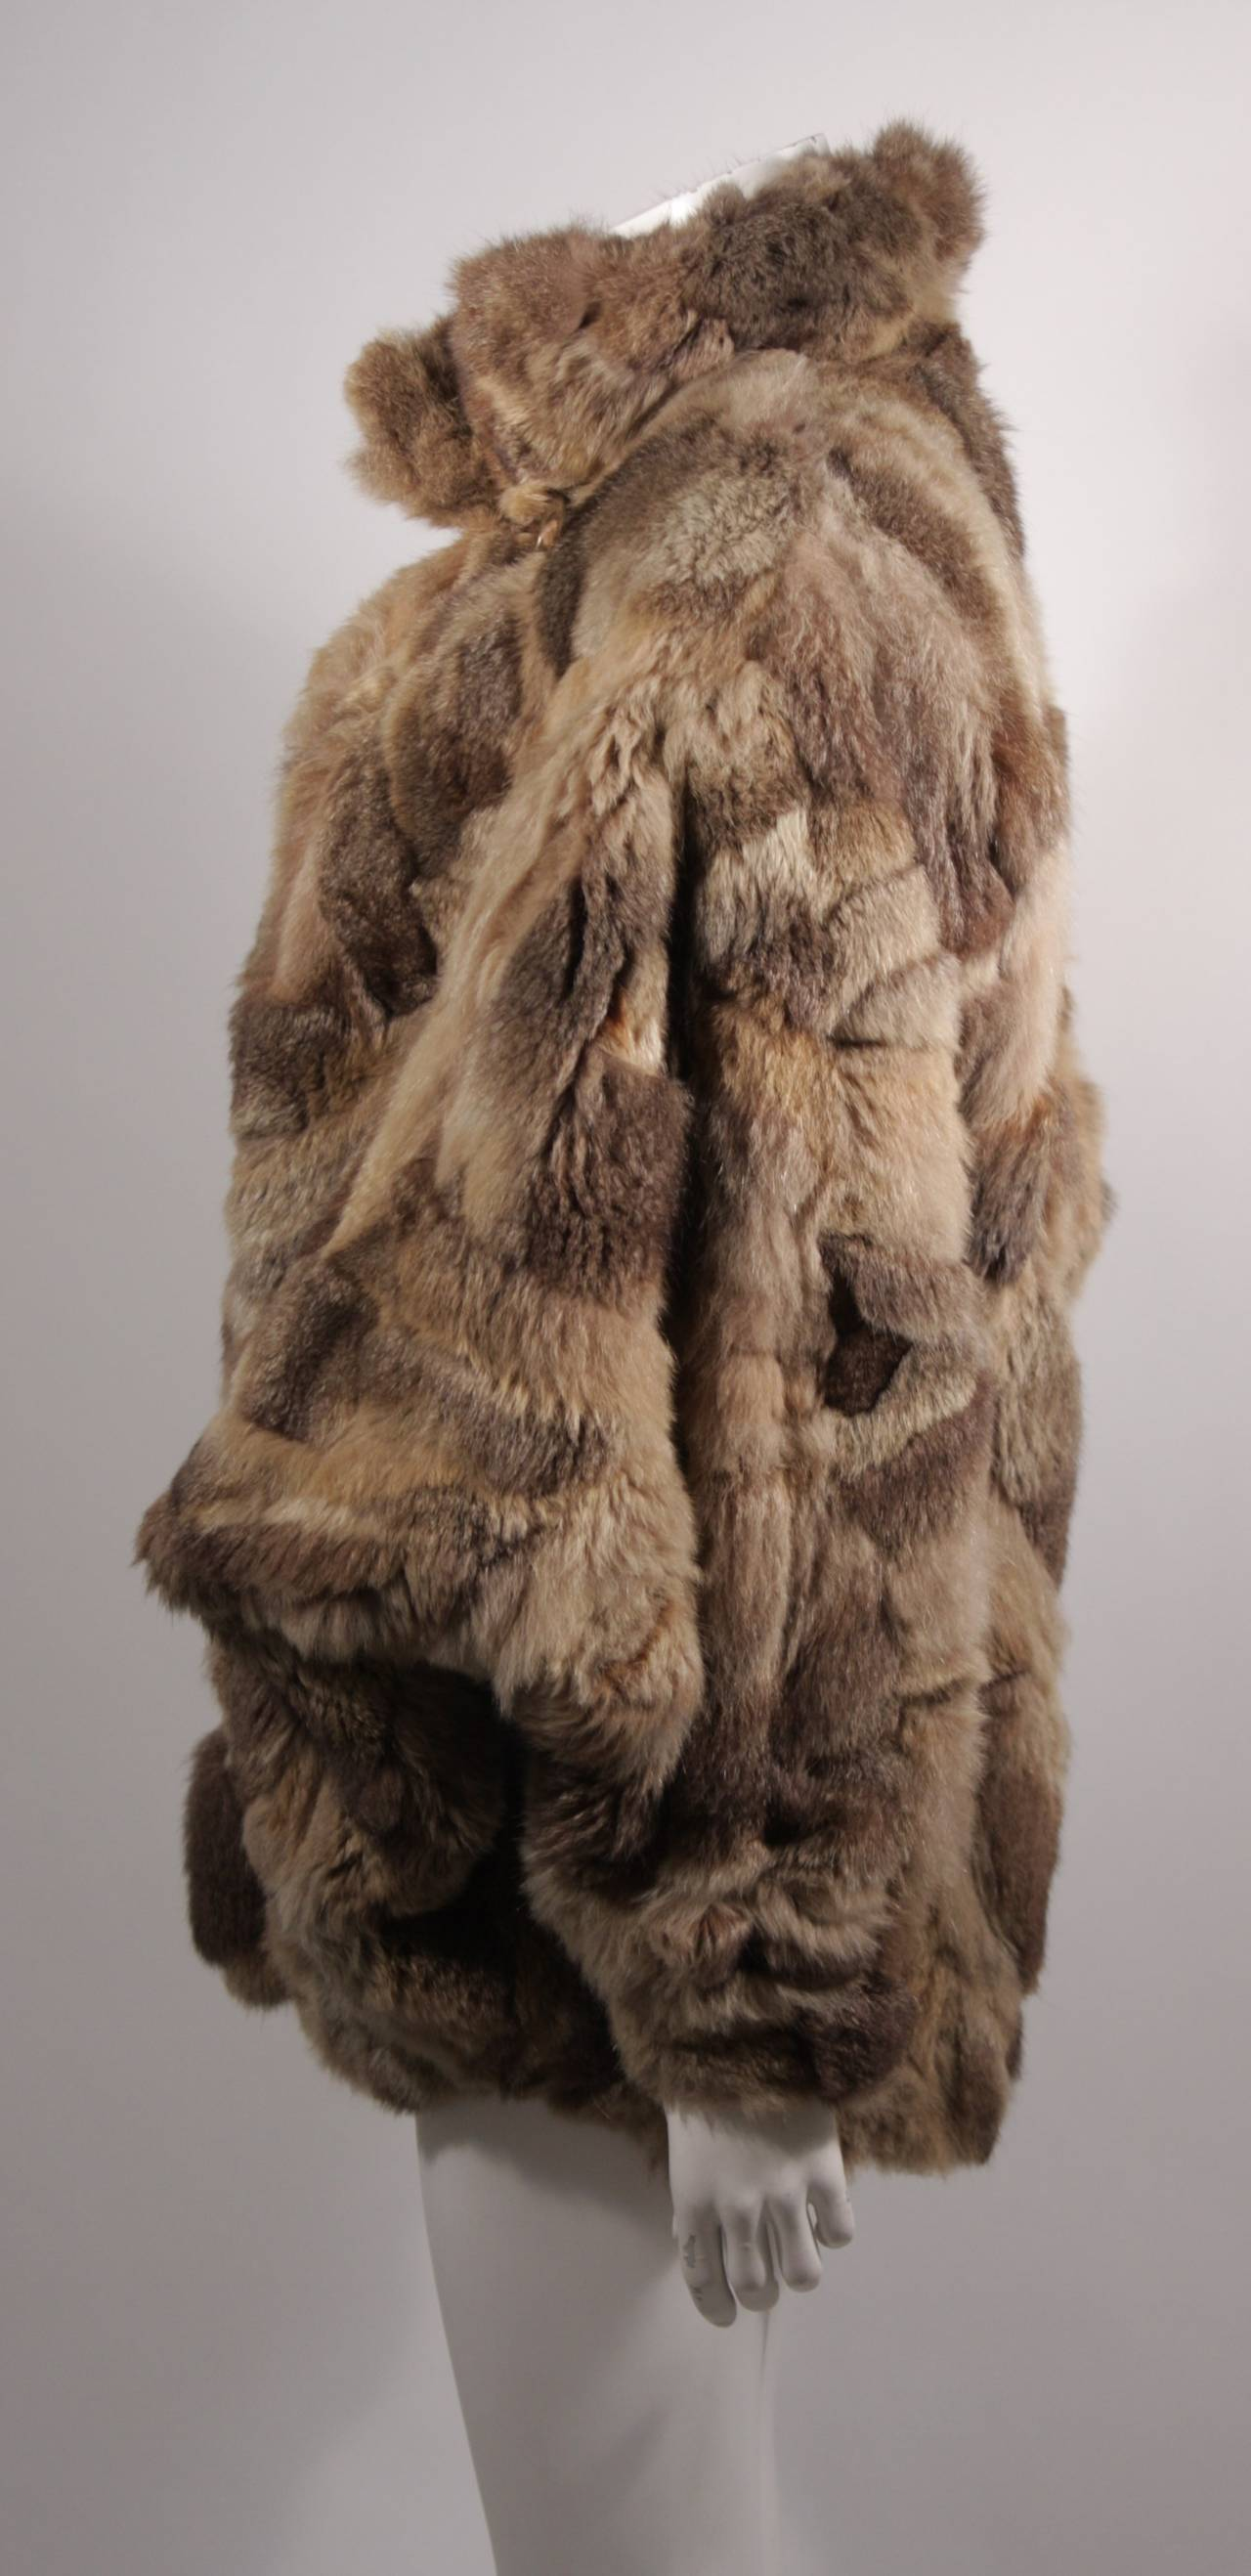 Fendi 365 Russian Squirrel Batwing Style Fur Coat At 1stdibs